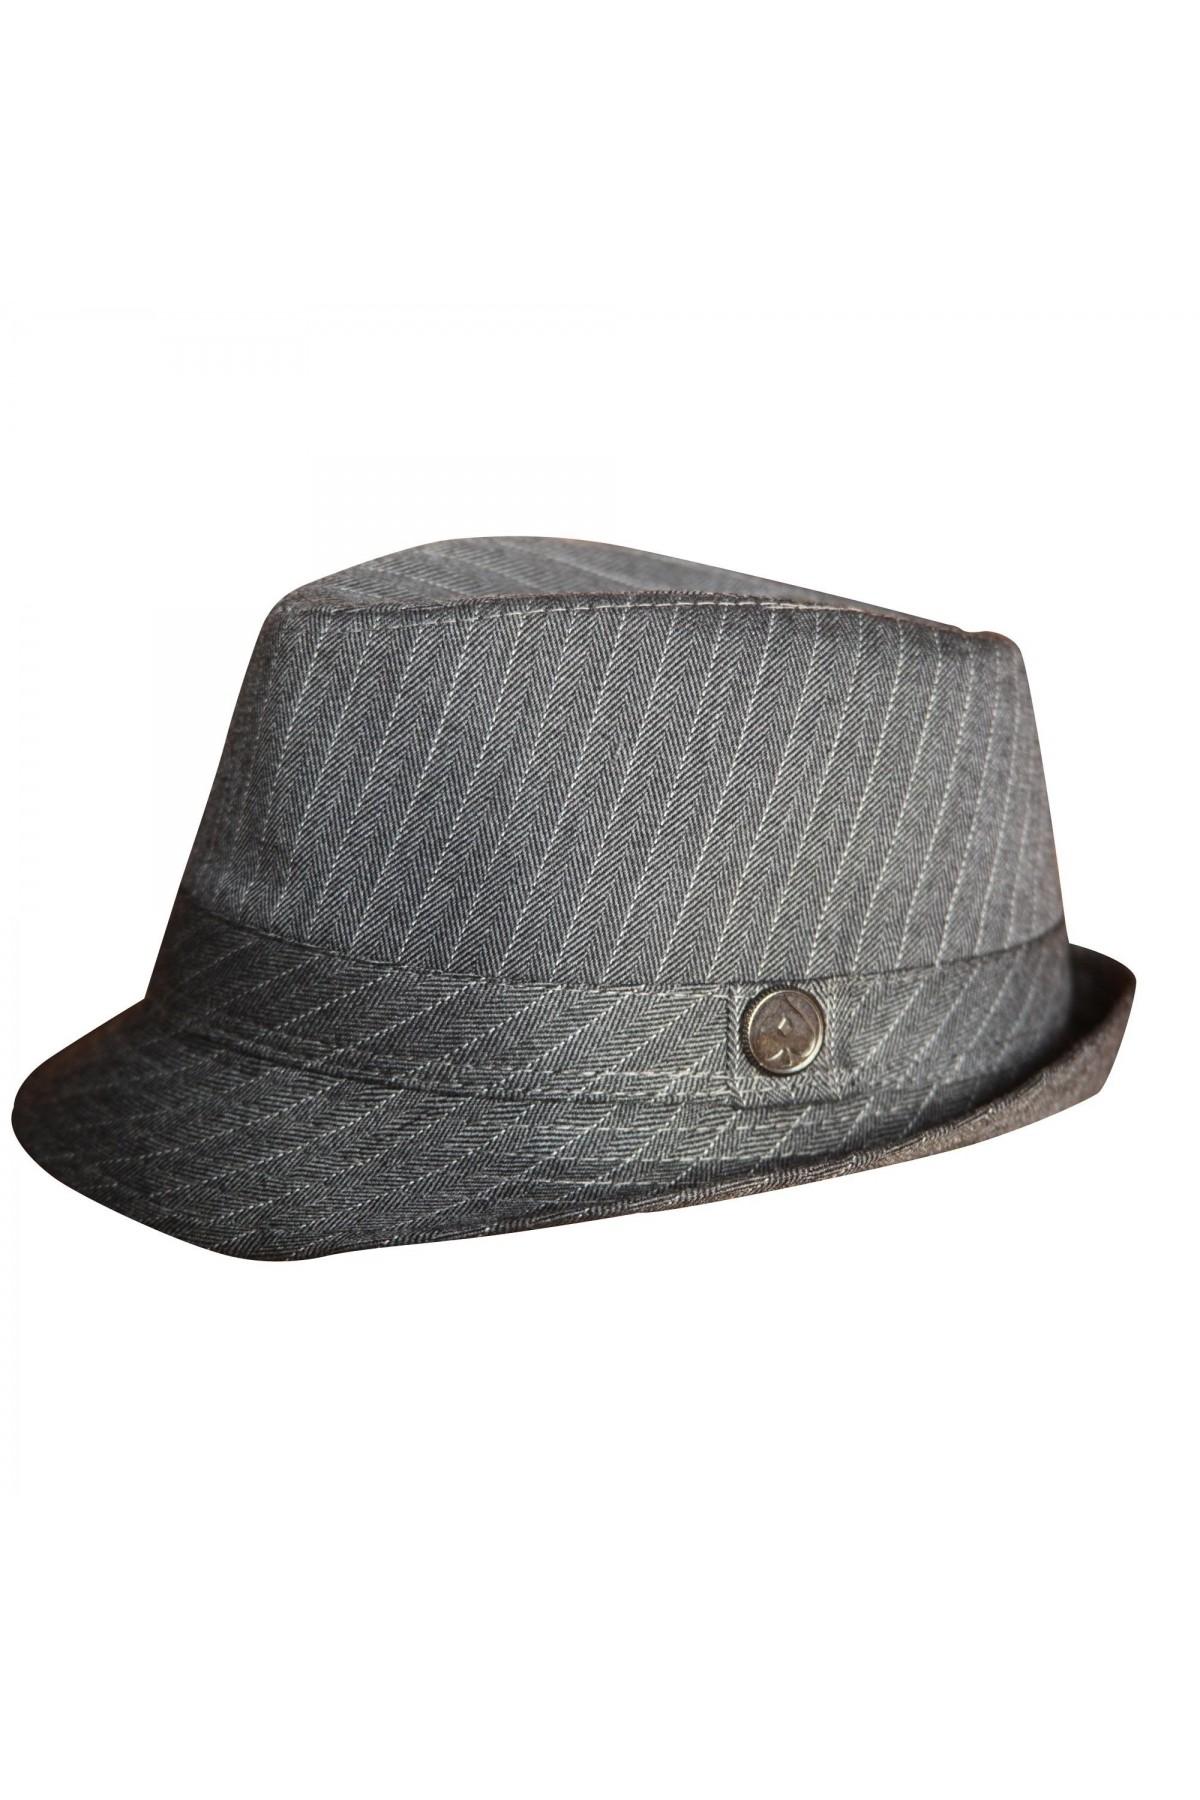 poker cap store holdew